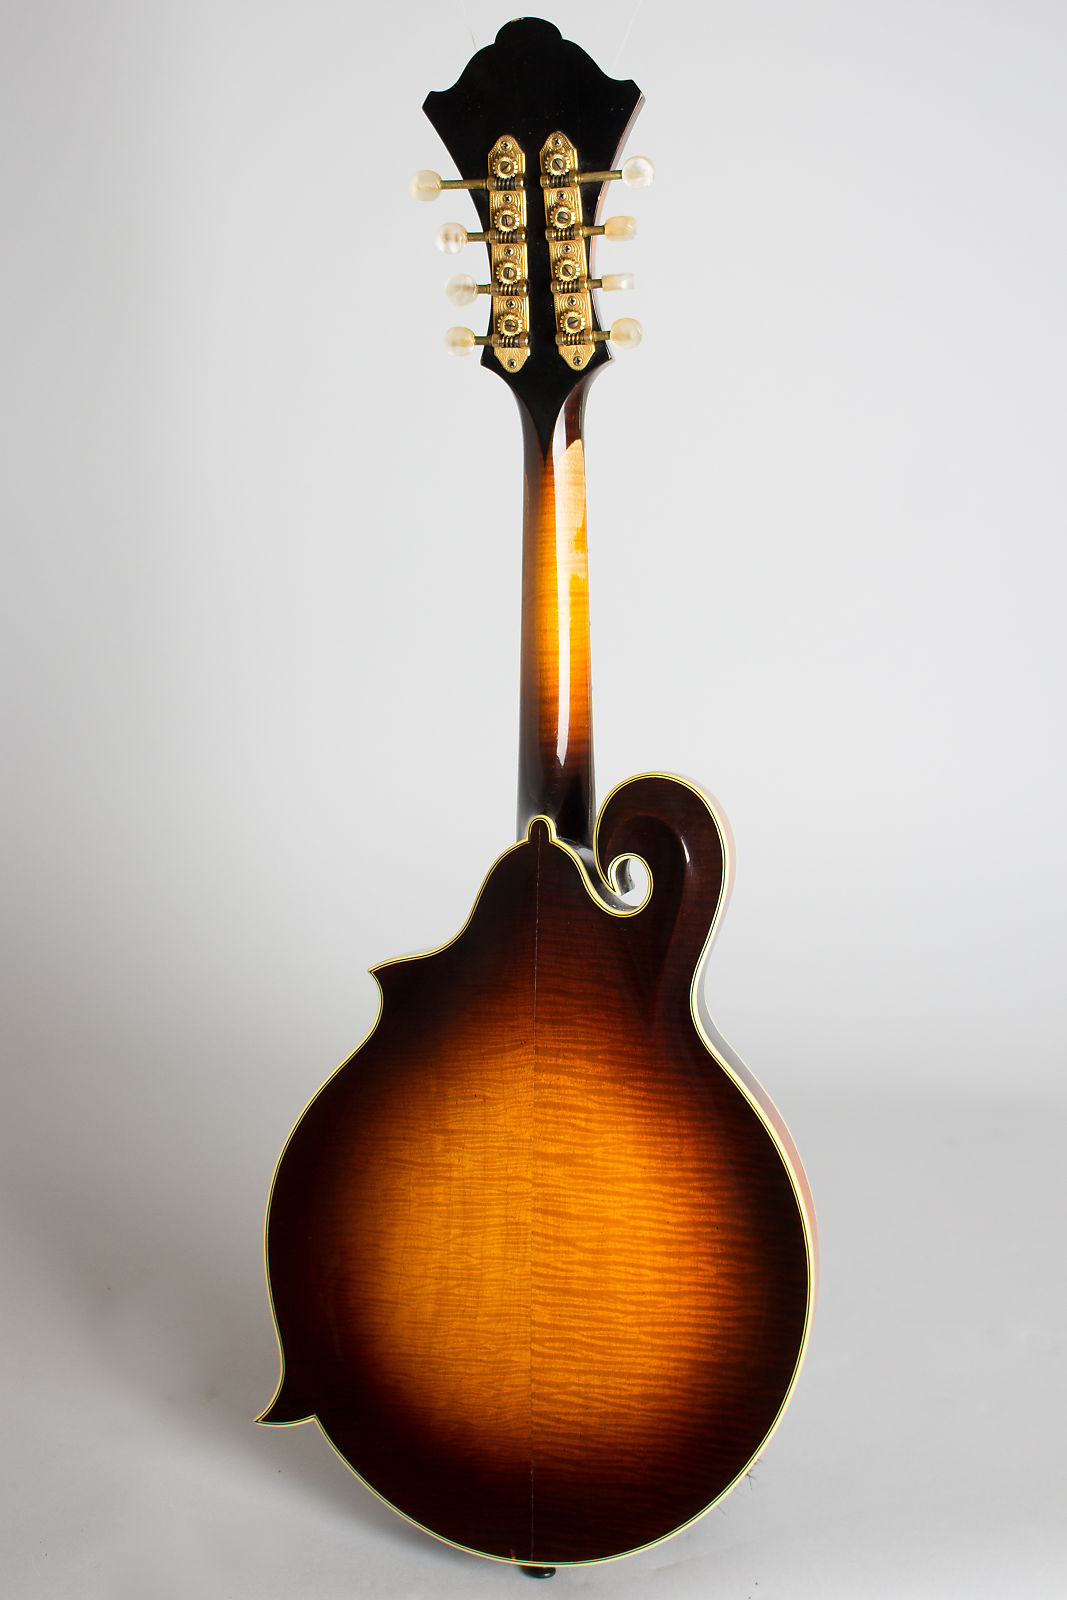 Monteleone  Grand Artist Carved Top Mandolin (1982), ser. #76, original black hard shell case.